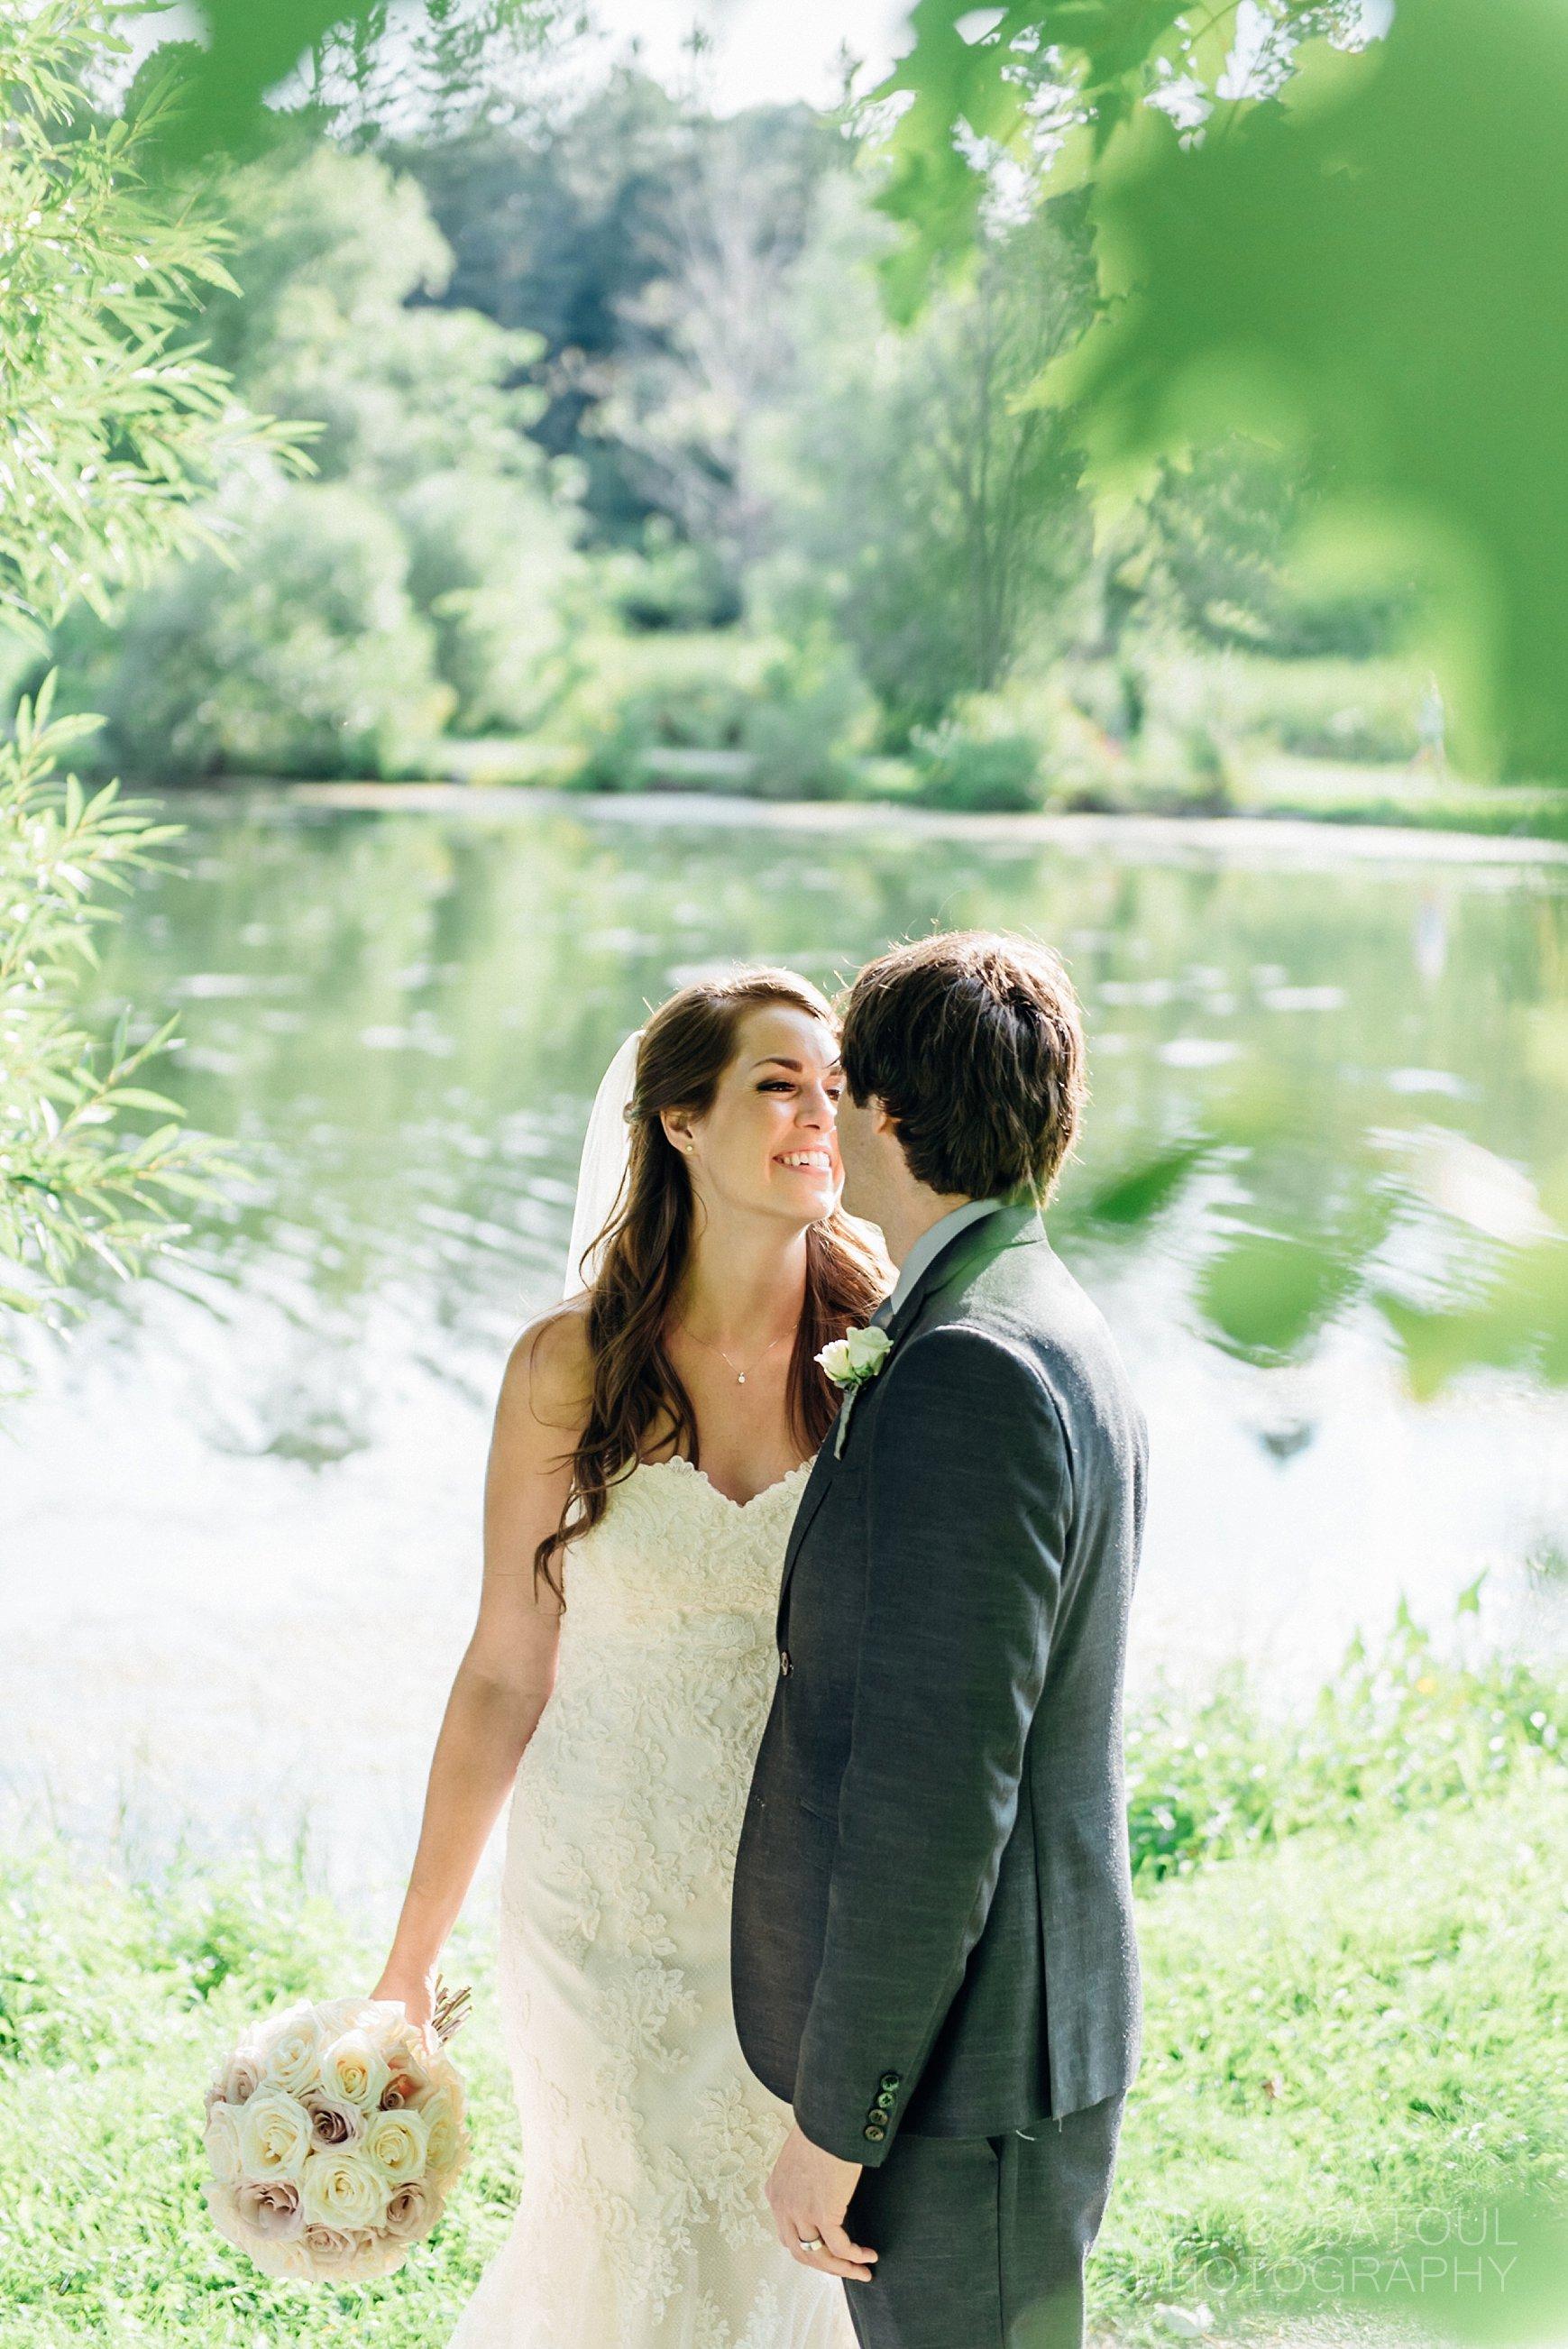 Ali & Batoul Photography - Documentary Fine Art Ottawa Wedding Photography_0054.jpg